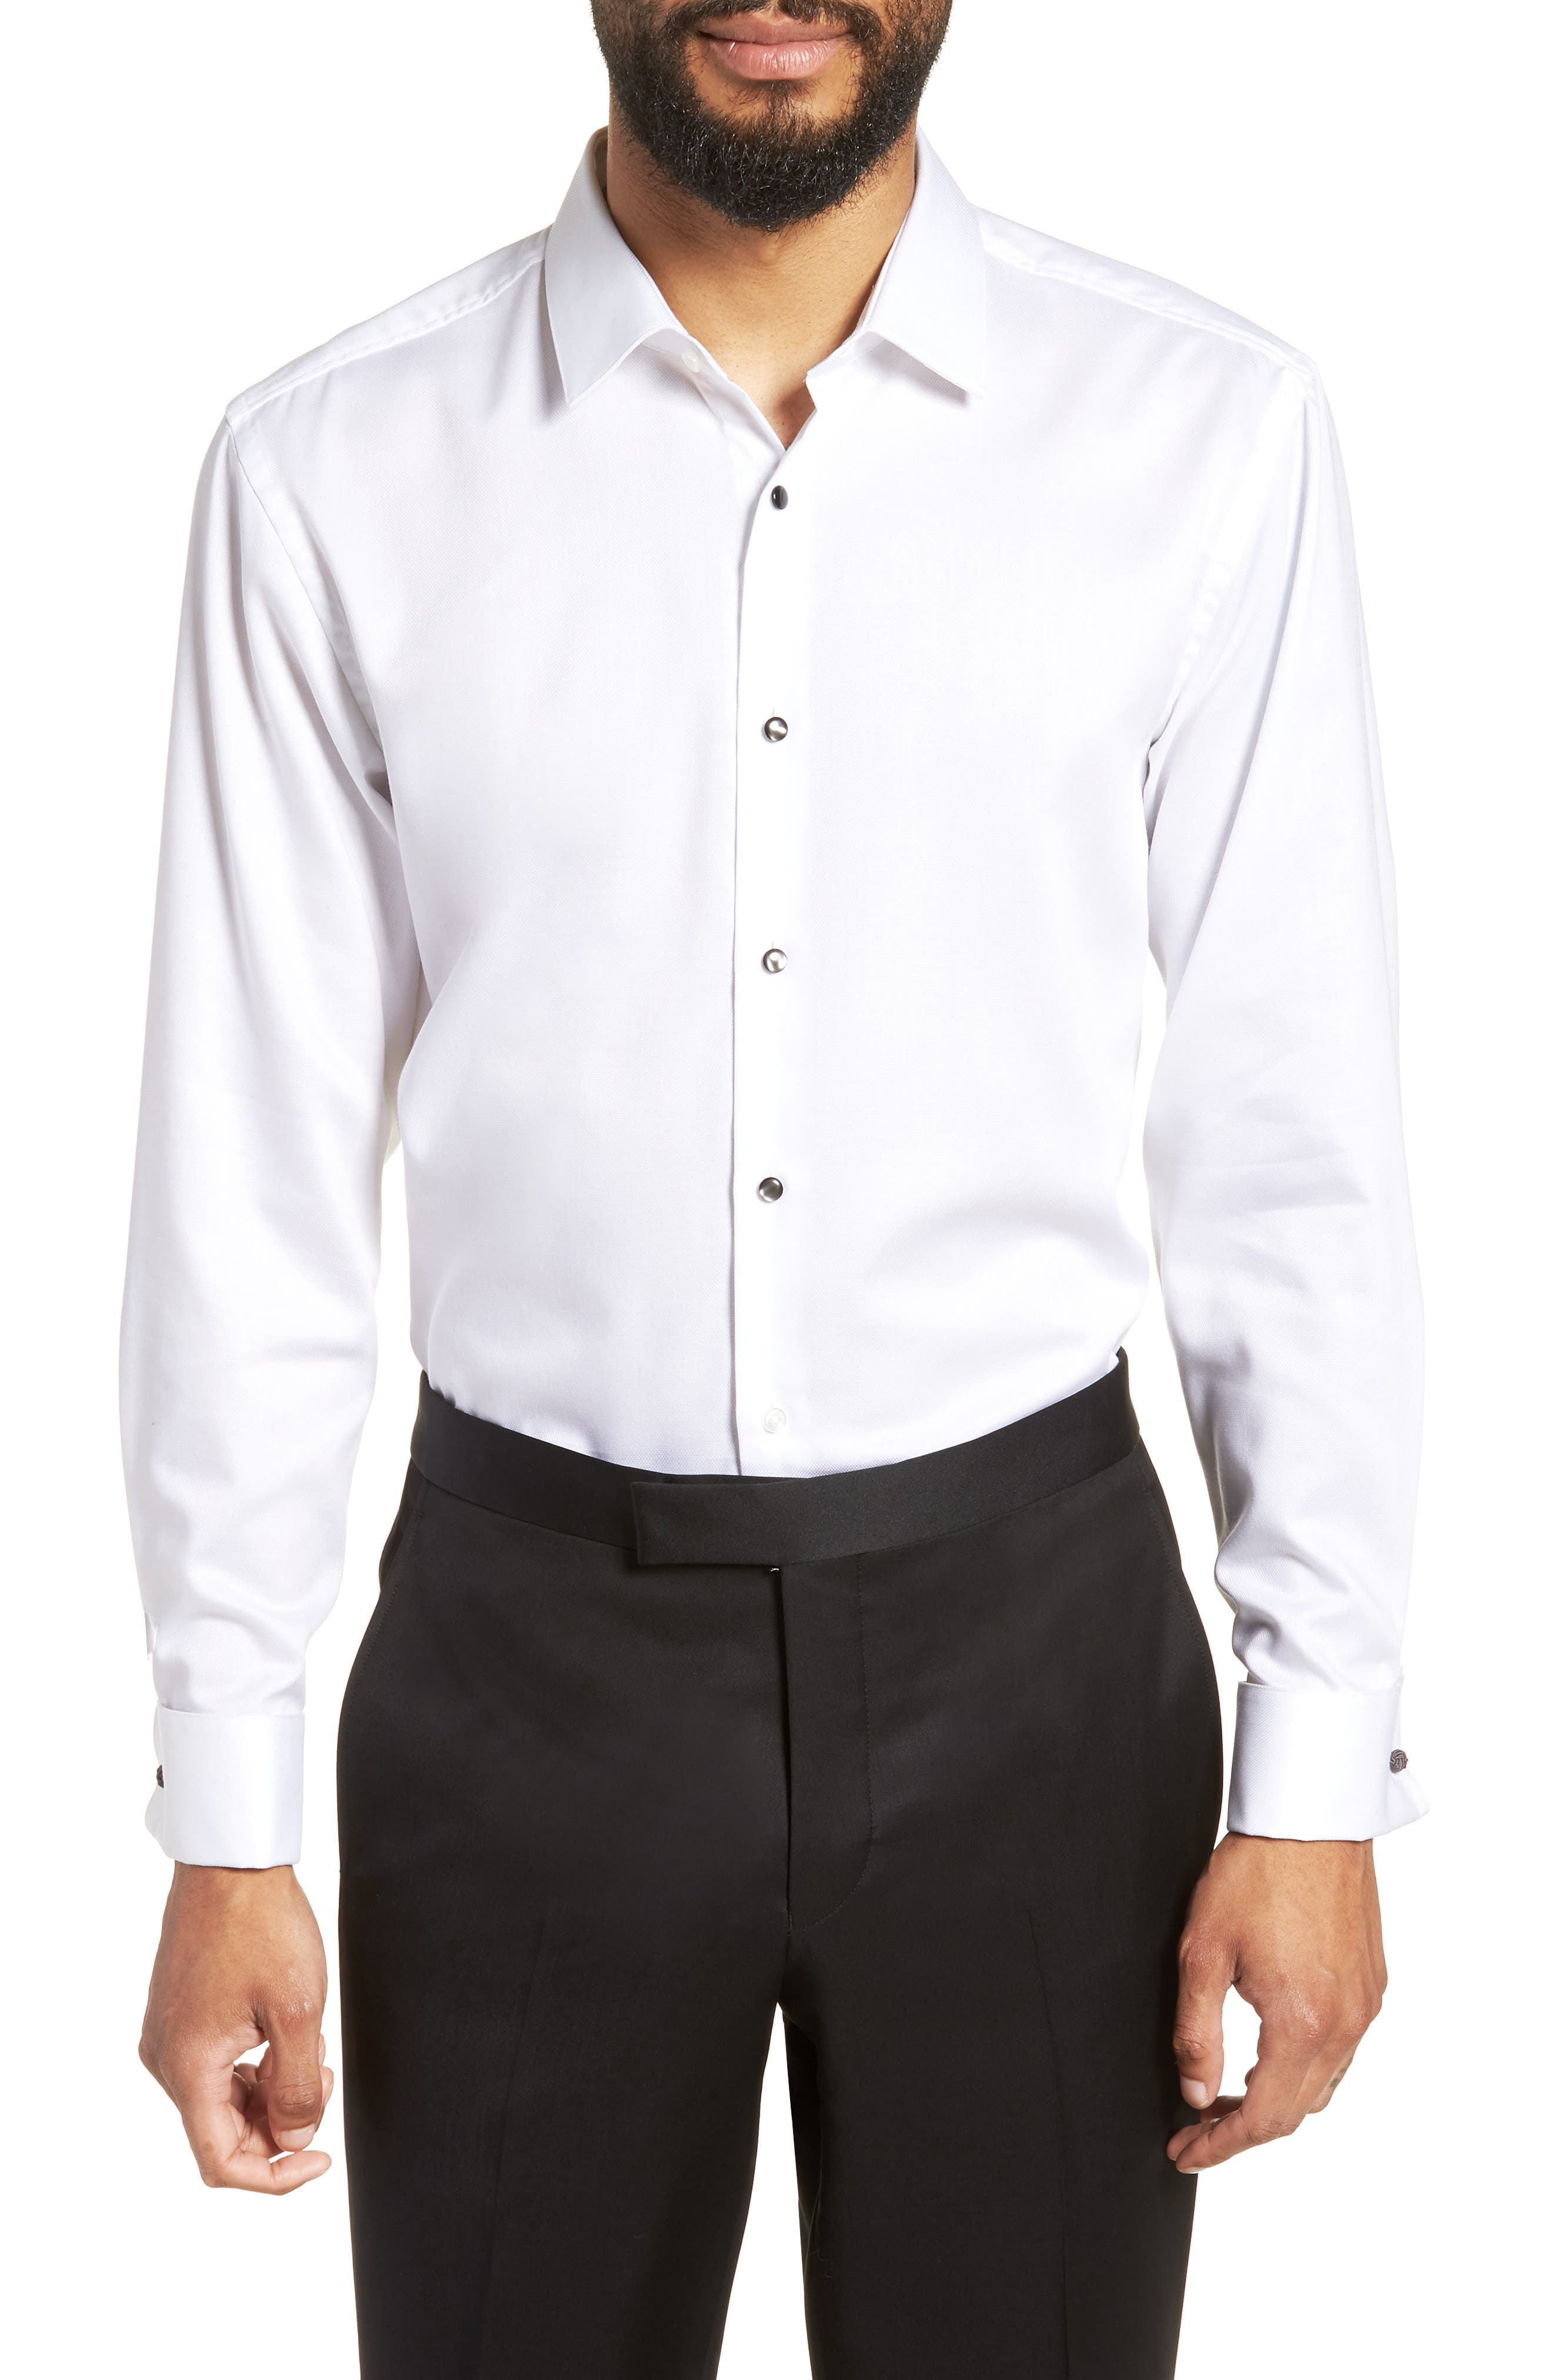 99e41e0abc1 Men s Tuxedo Shirts